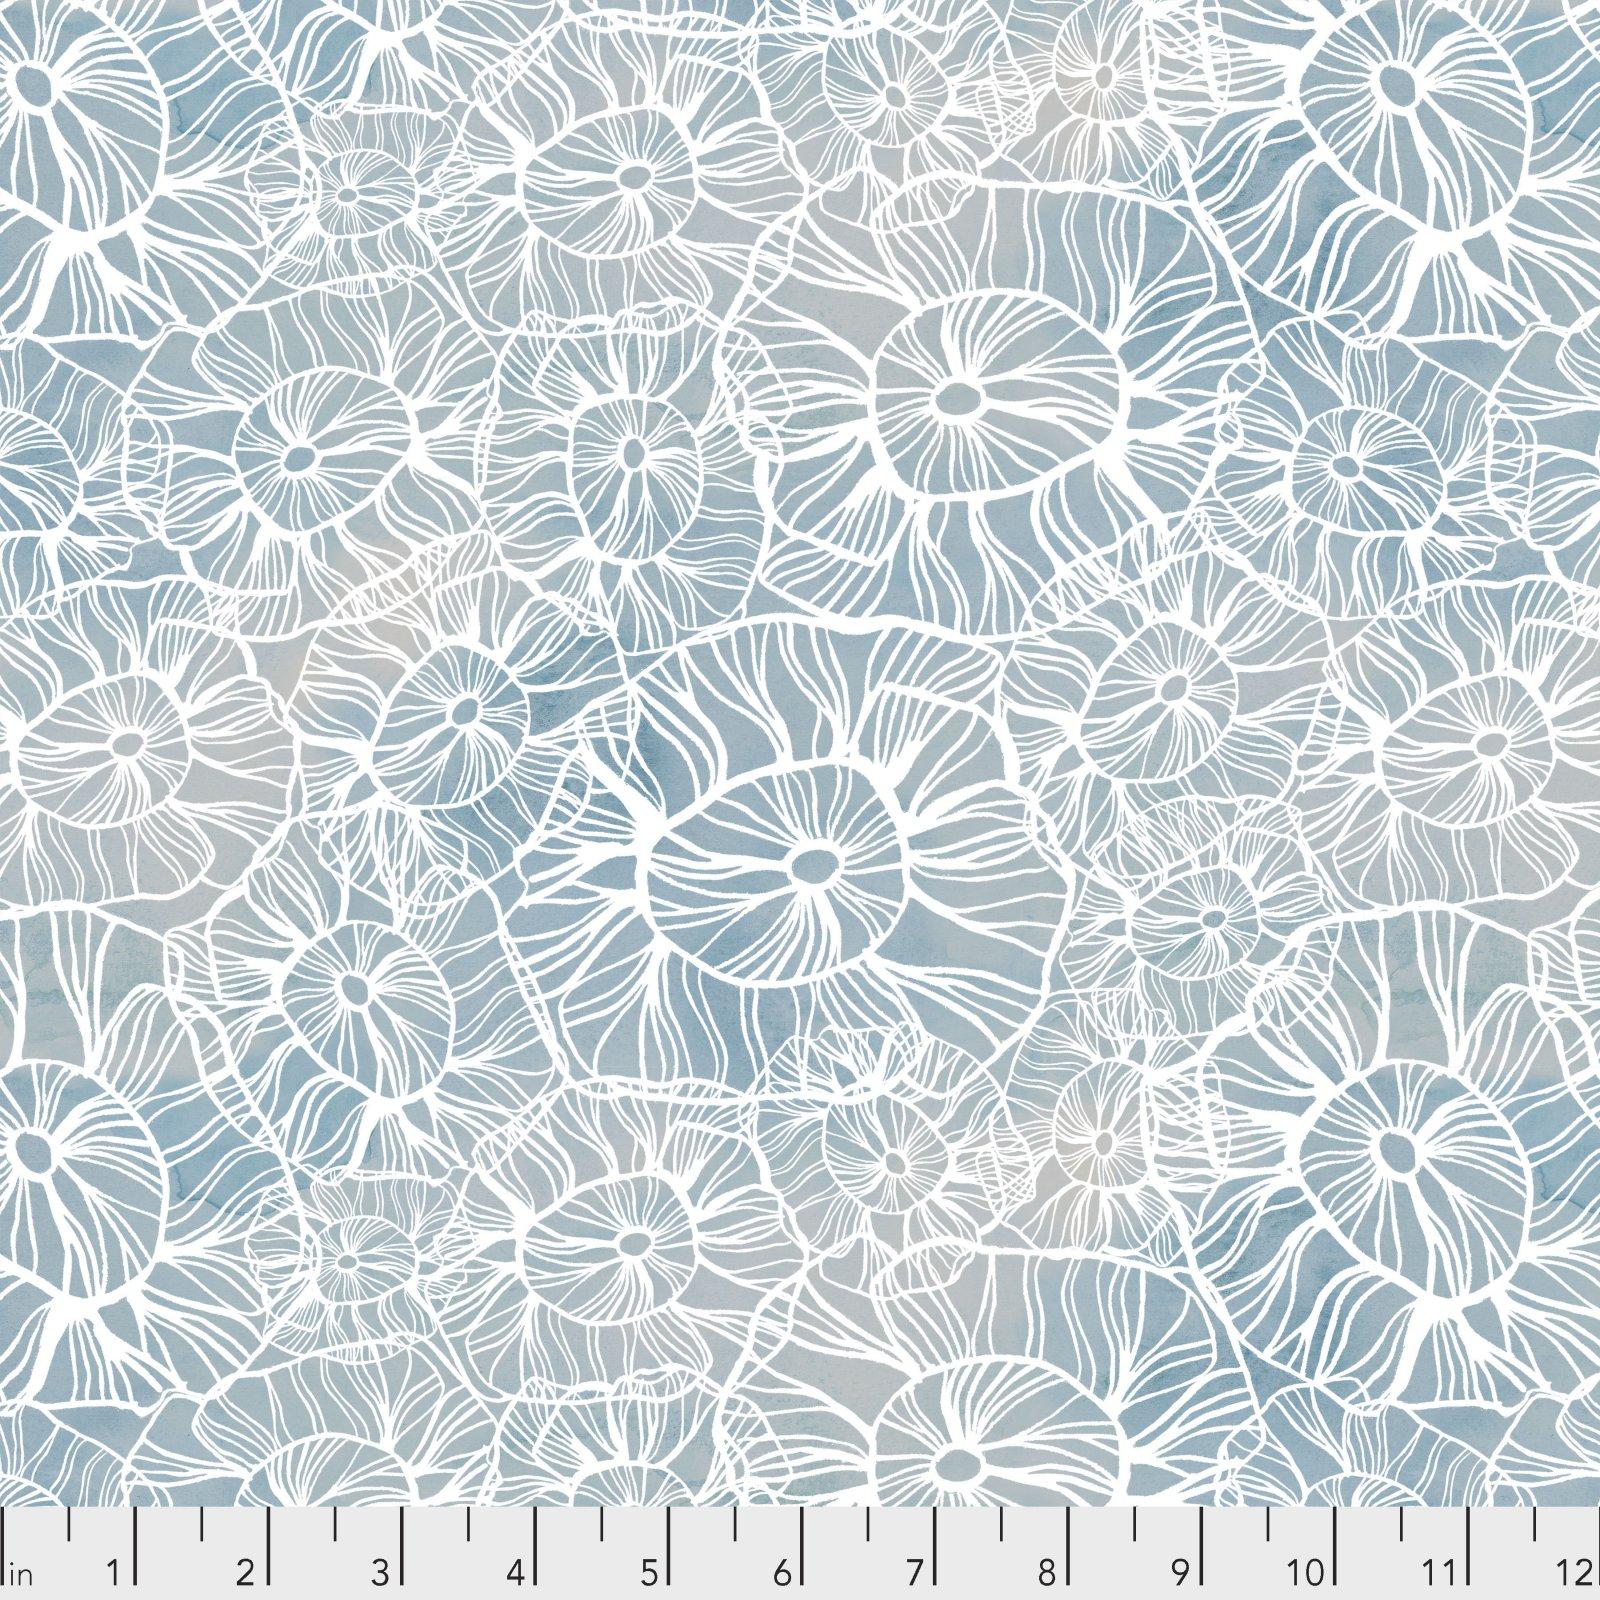 Time & Tide by Shell Rummel for Free Spirit Fabrics -Sea Flower - Ocean